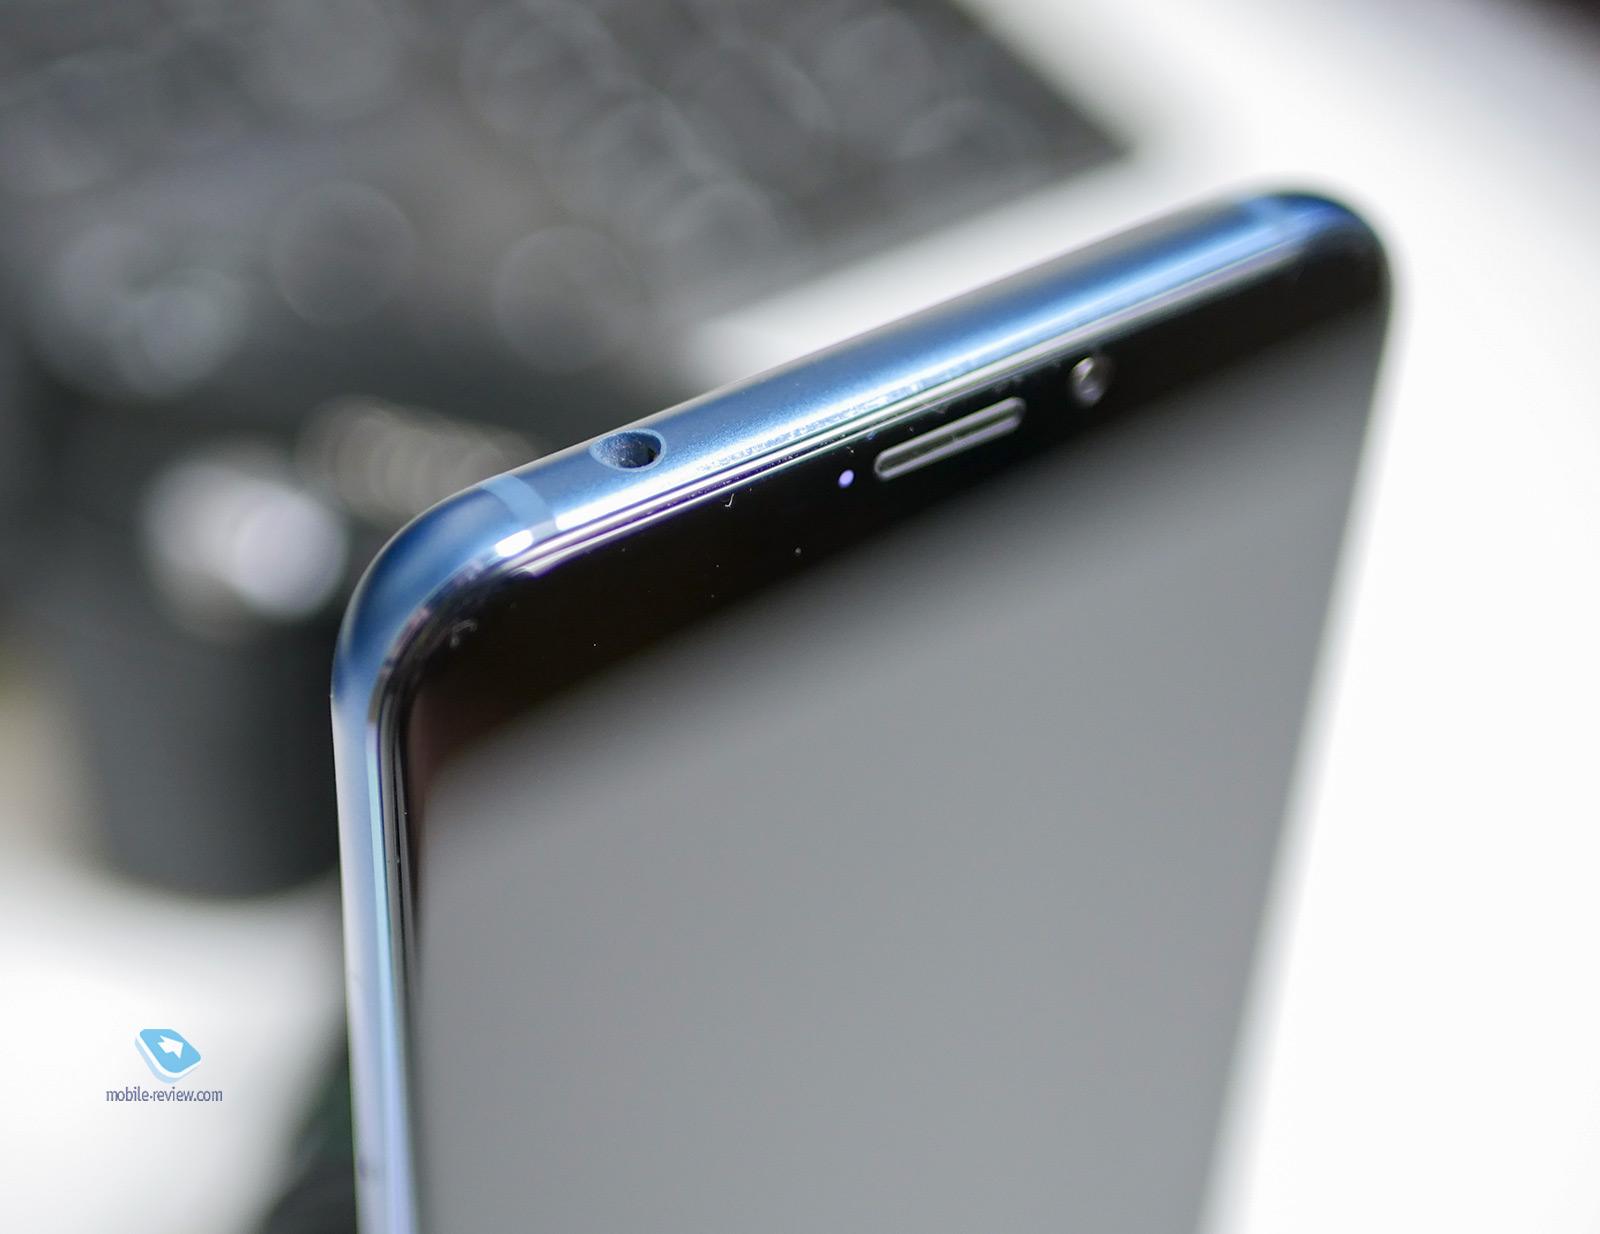 Внешний NFC-модуль для смартфона – можно ли настроить самому | NFC Wiki - всё о технологии NFC